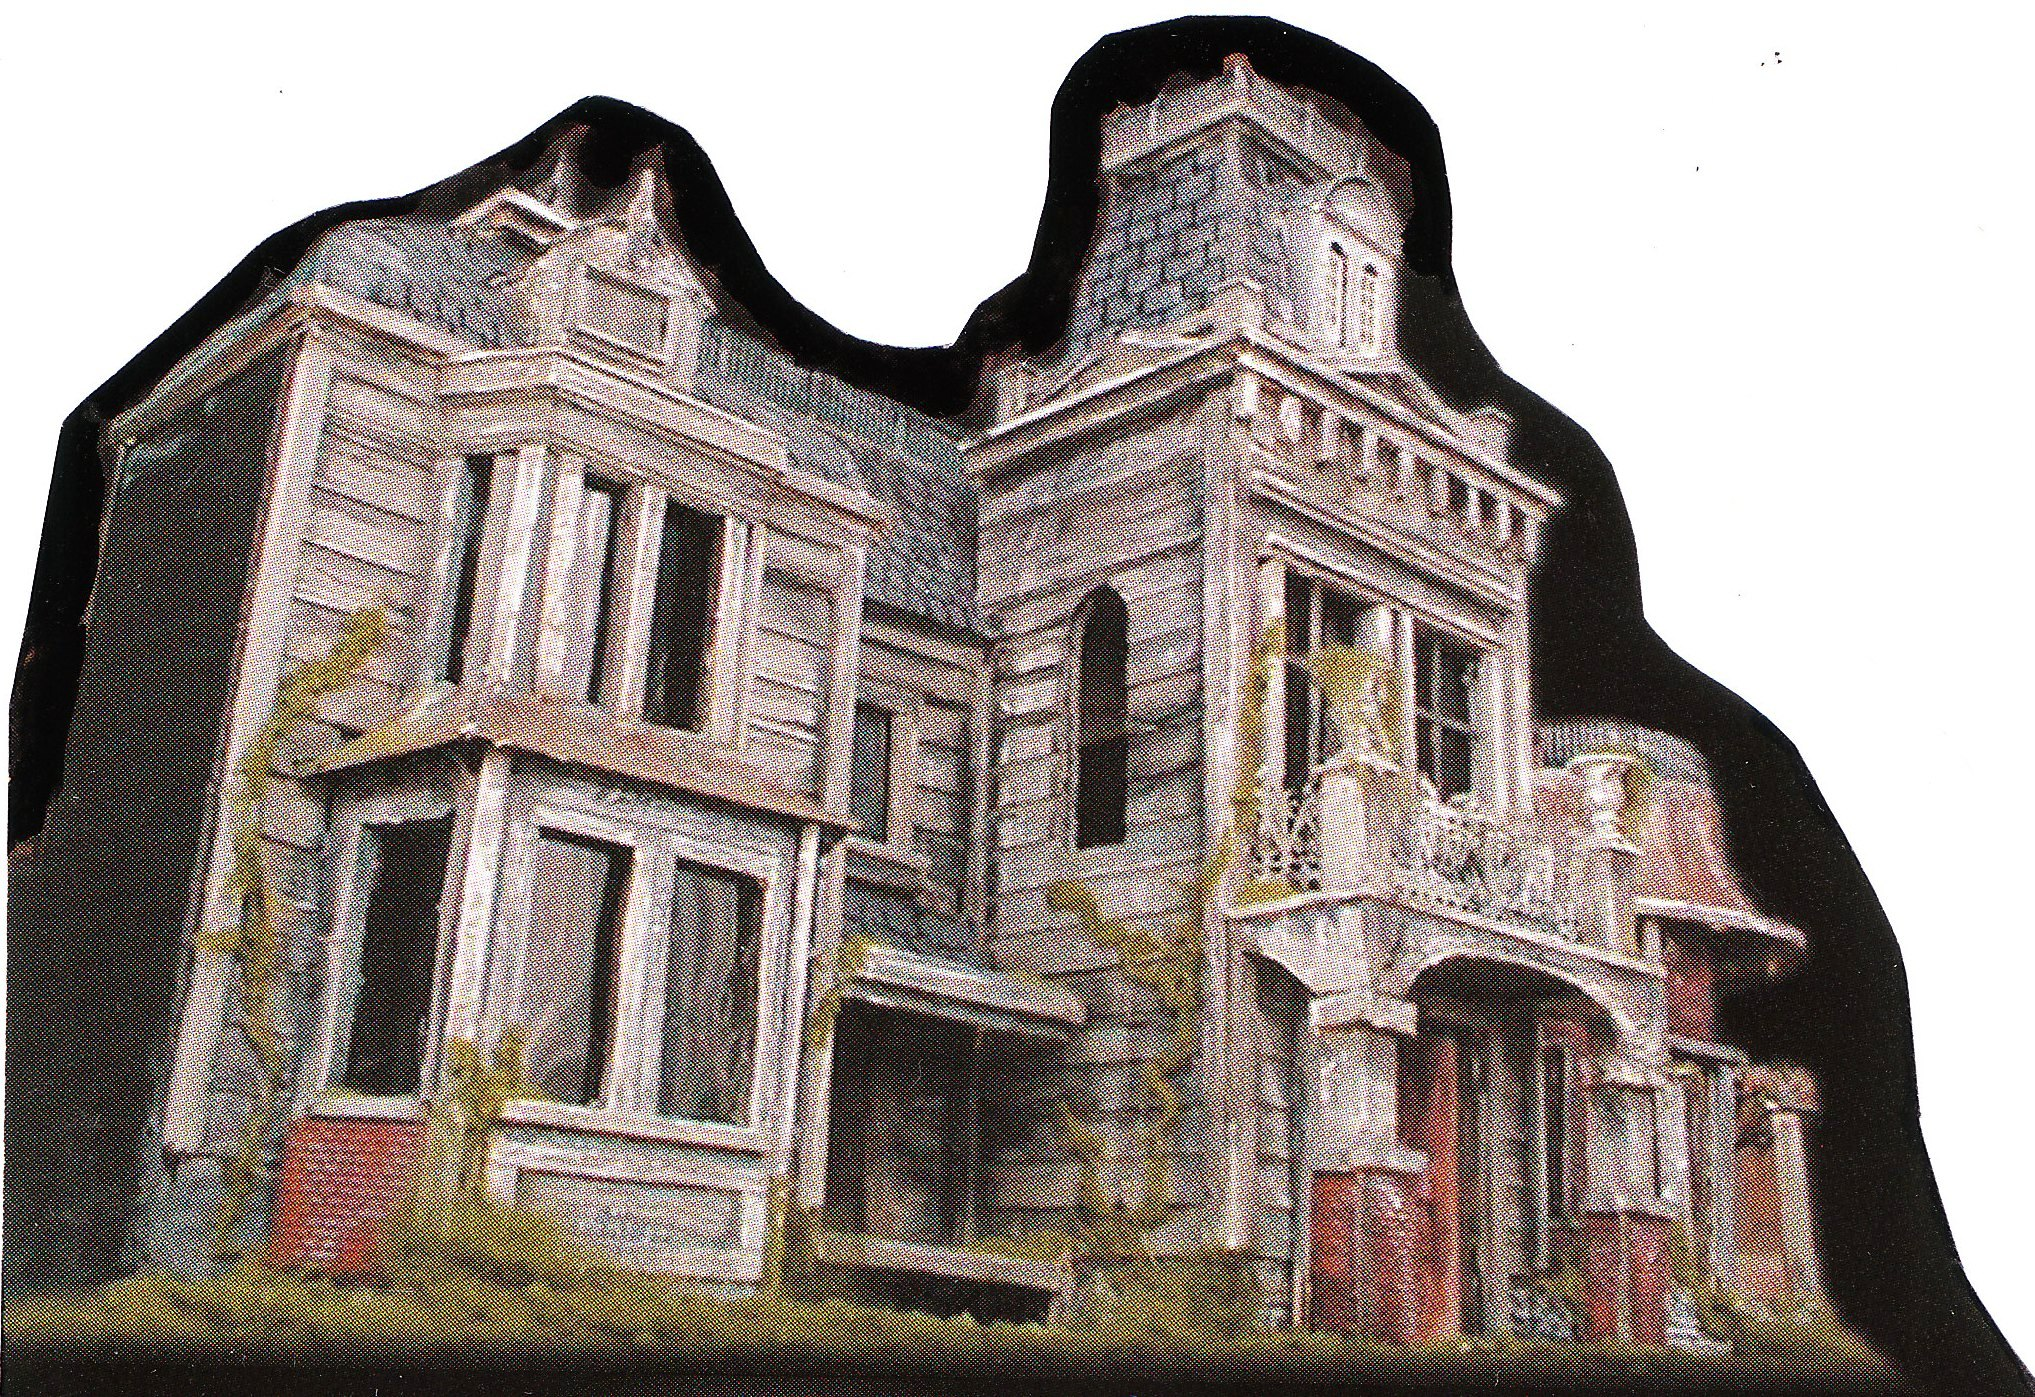 Diy haunted house facade